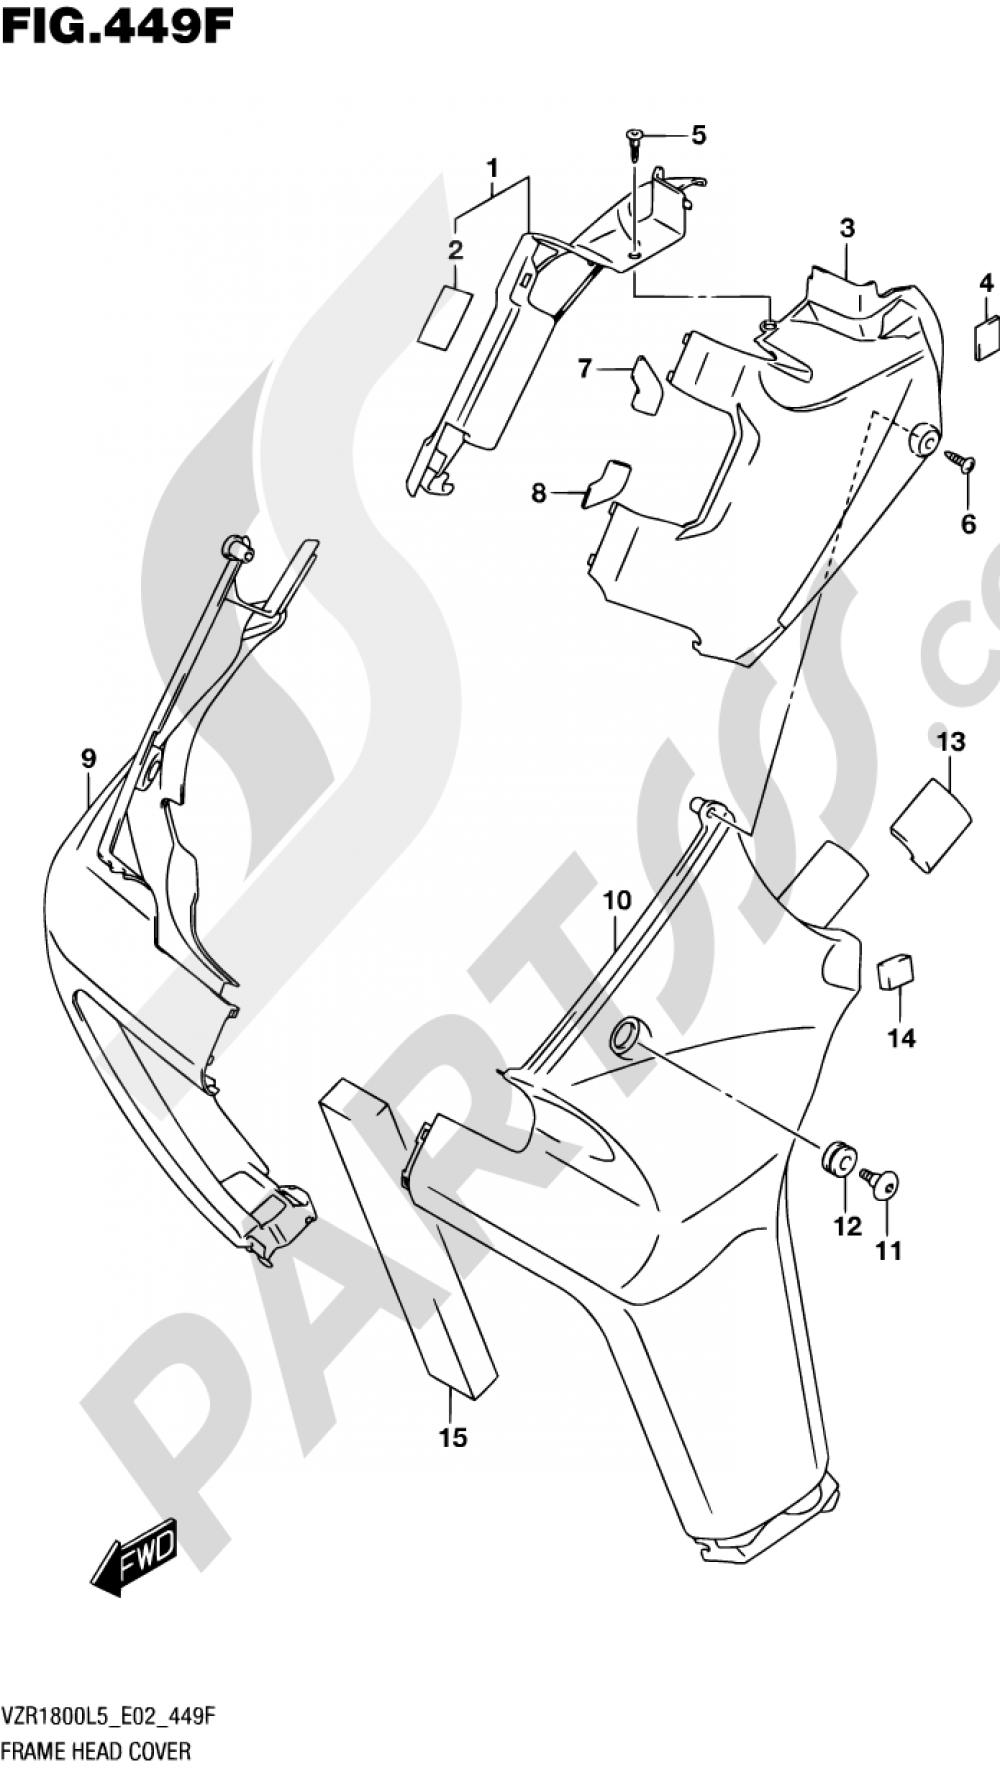 449F - FRAME HEAD COVER (VZR1800BZUFL5 E19) Suzuki VZR1800 2015